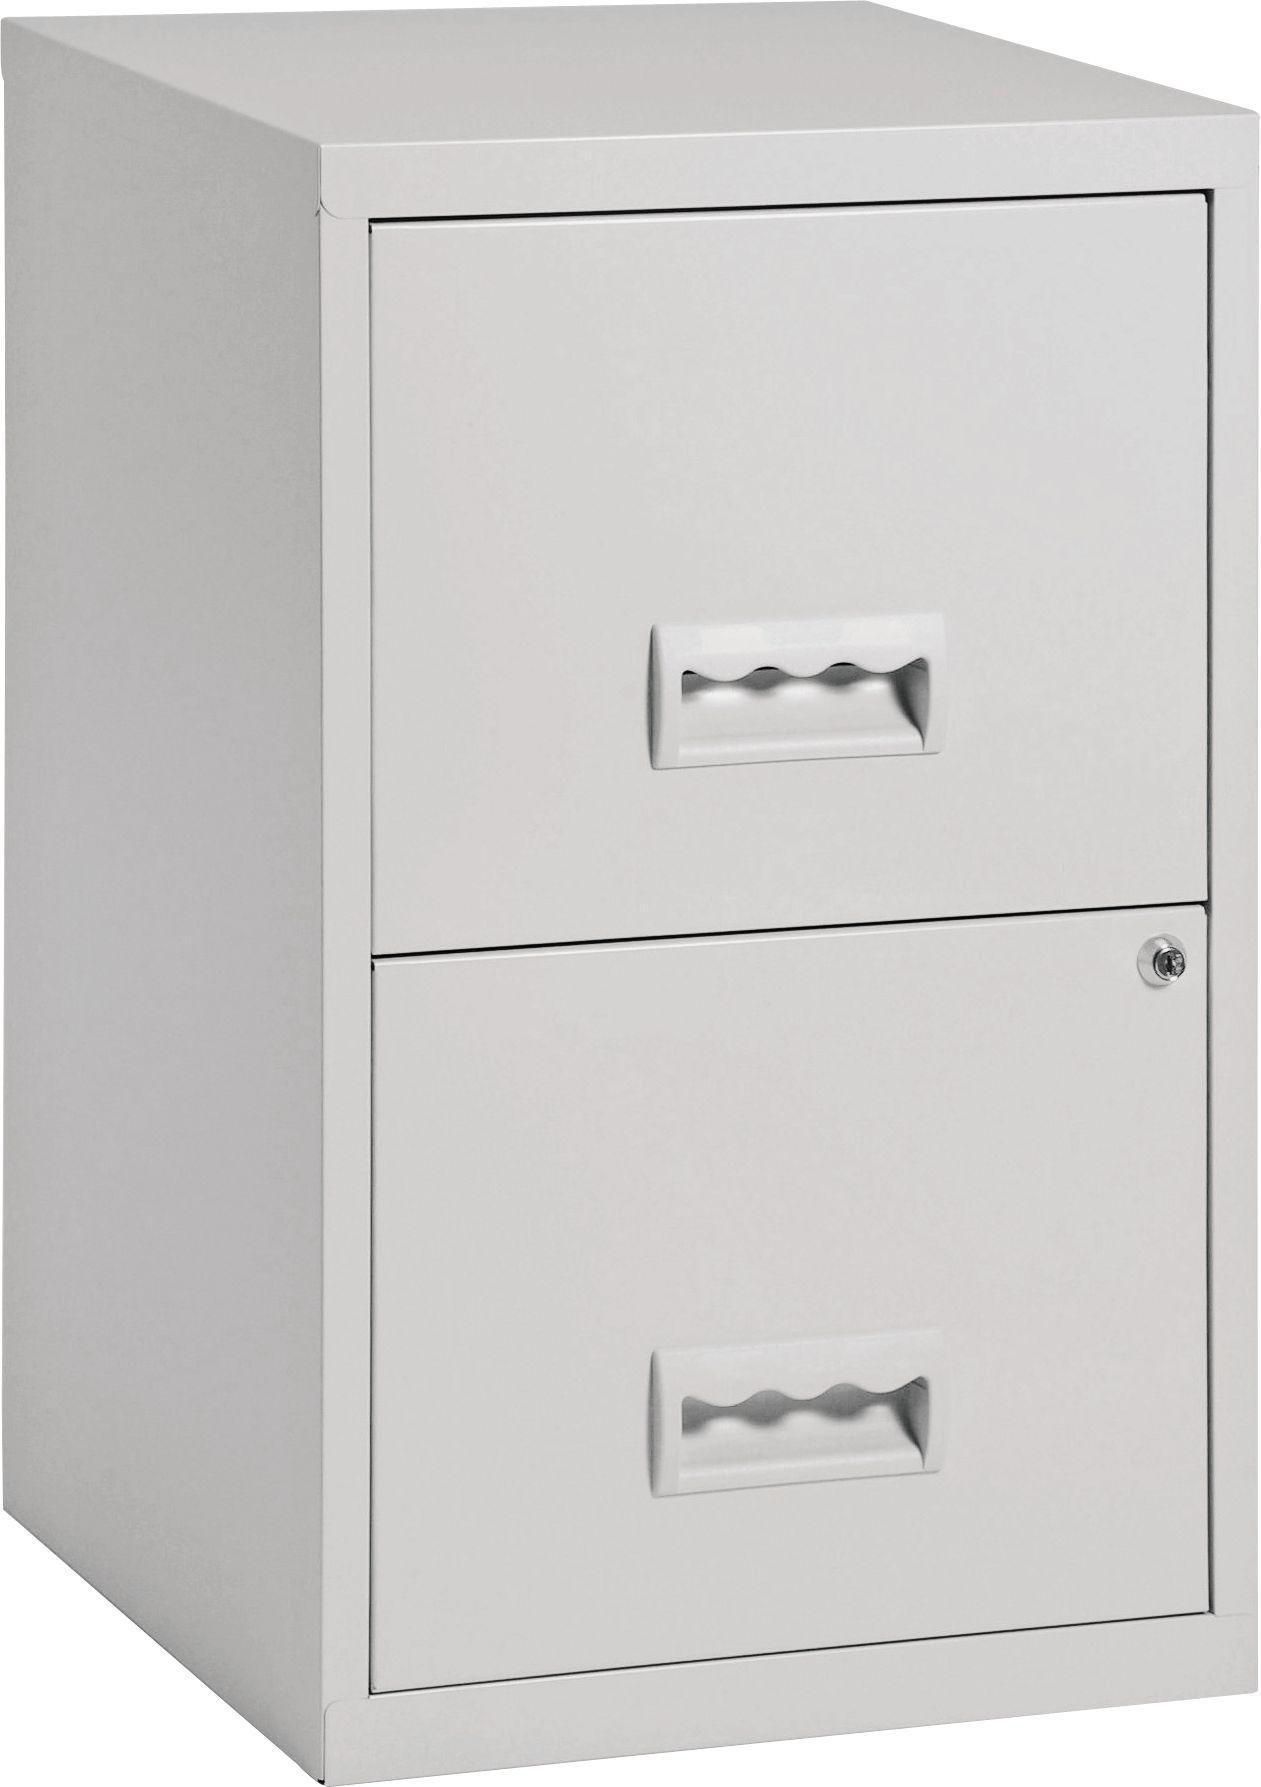 pierre henry 2 drawer filing cabinet grey